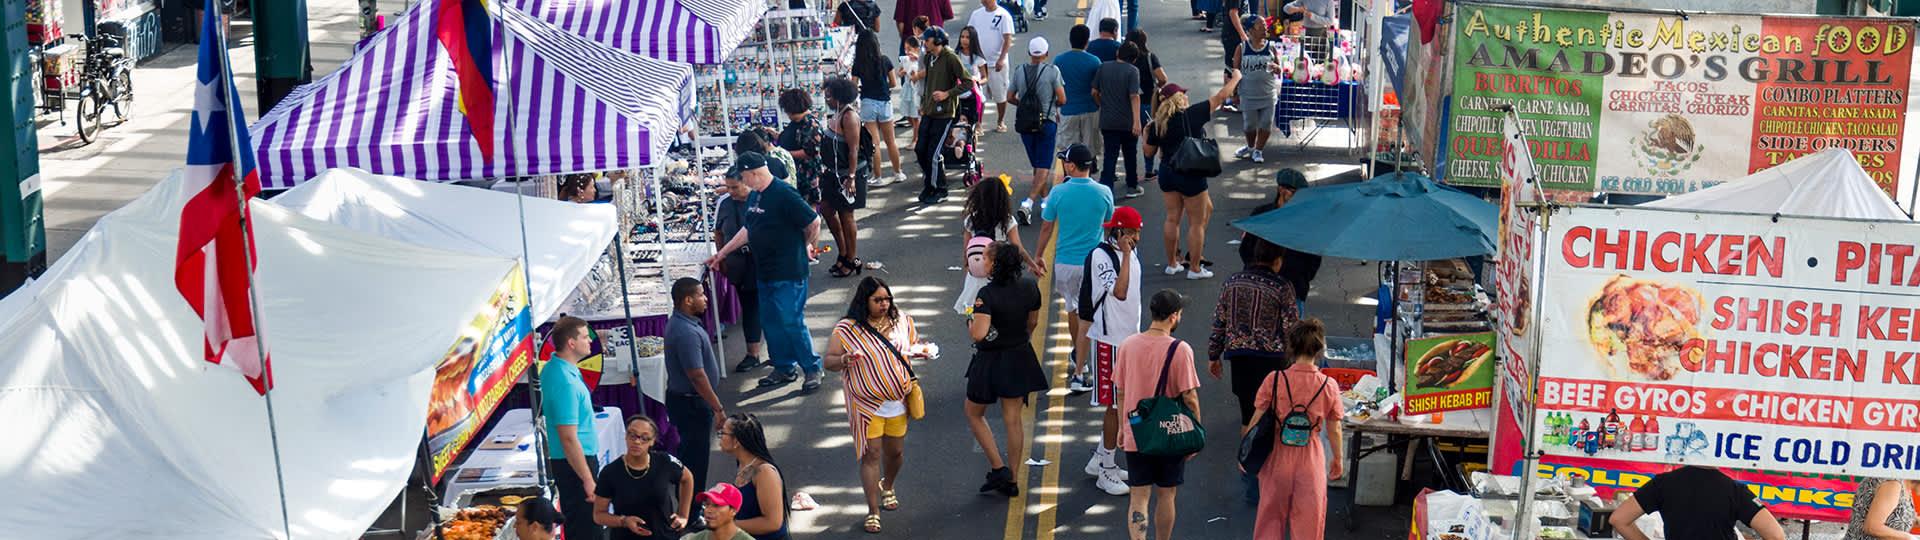 street fair in the south bronx, nyc